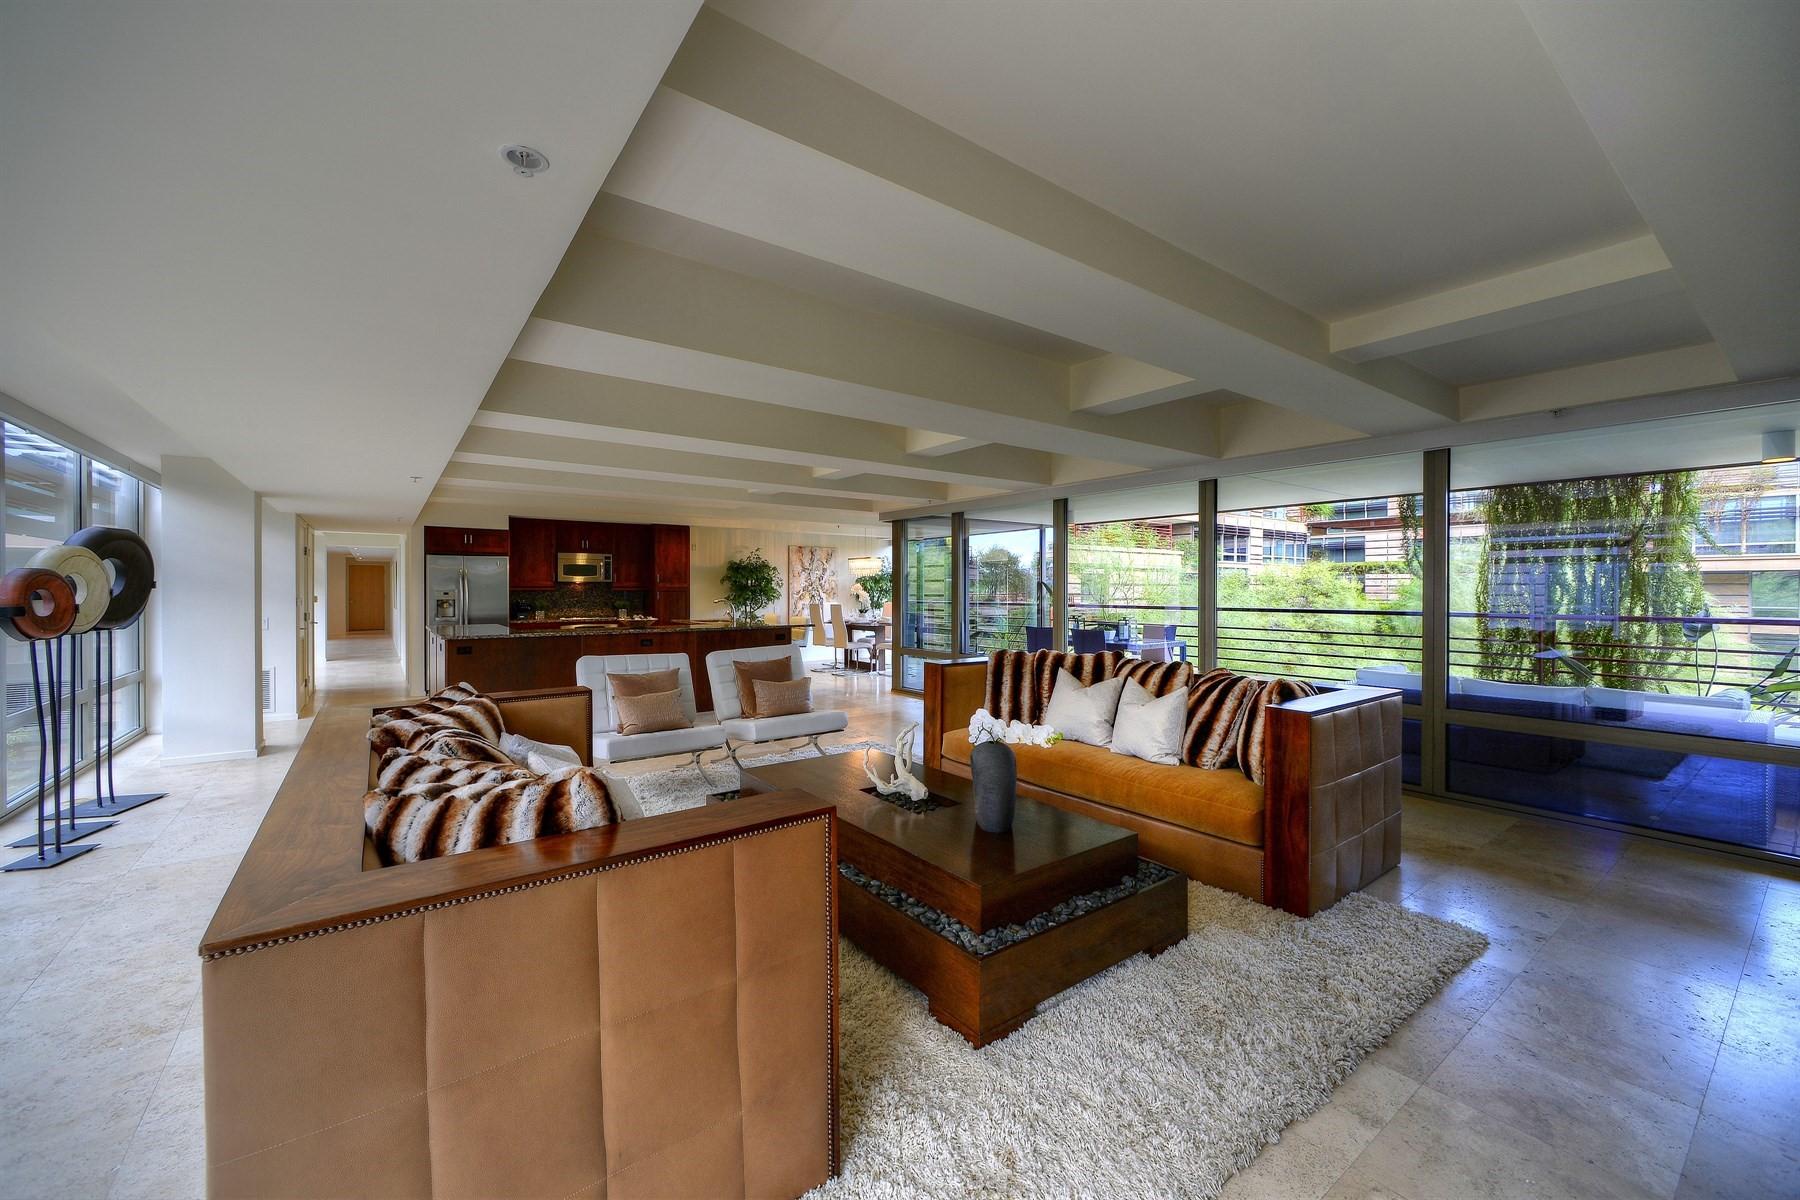 Apartment for Sale at Top Floor Bridge Condo at Optima Camelview Village 7167 E Rancho Vista Dr #4014, Scottsdale, Arizona, 85251 United States